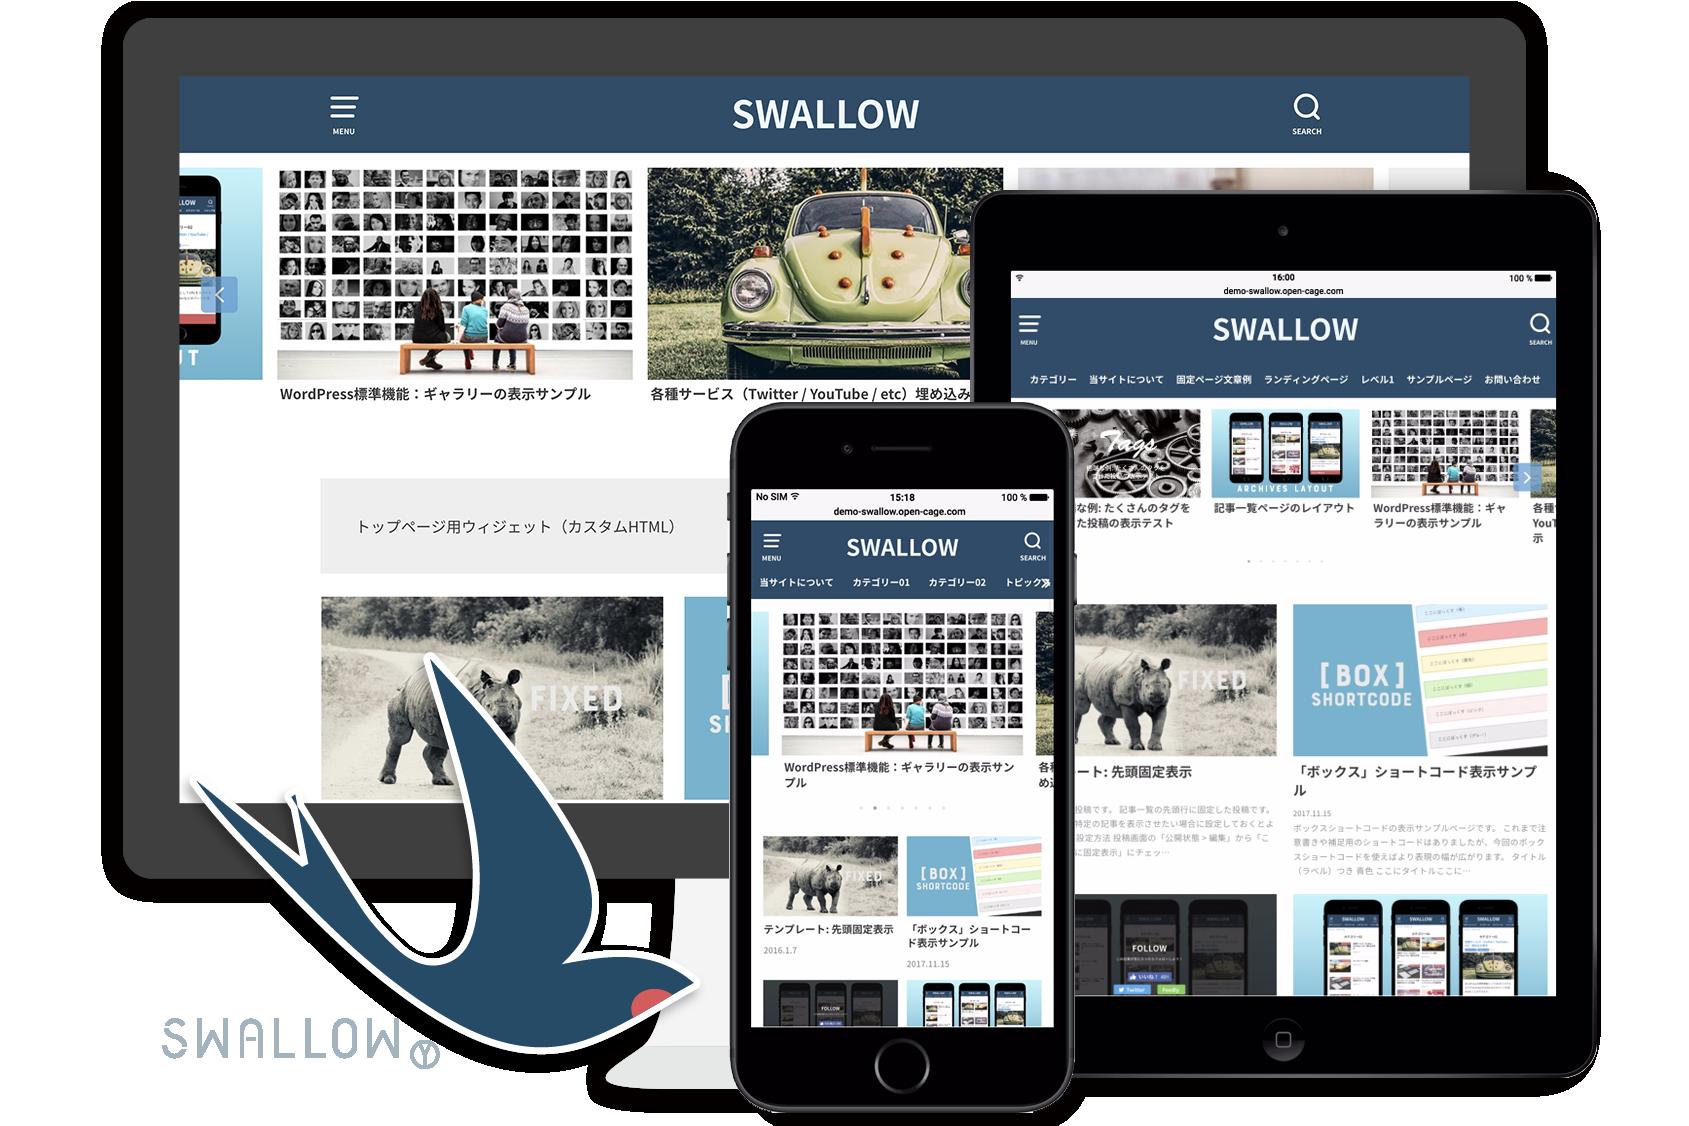 SWALLOW パソコン画面